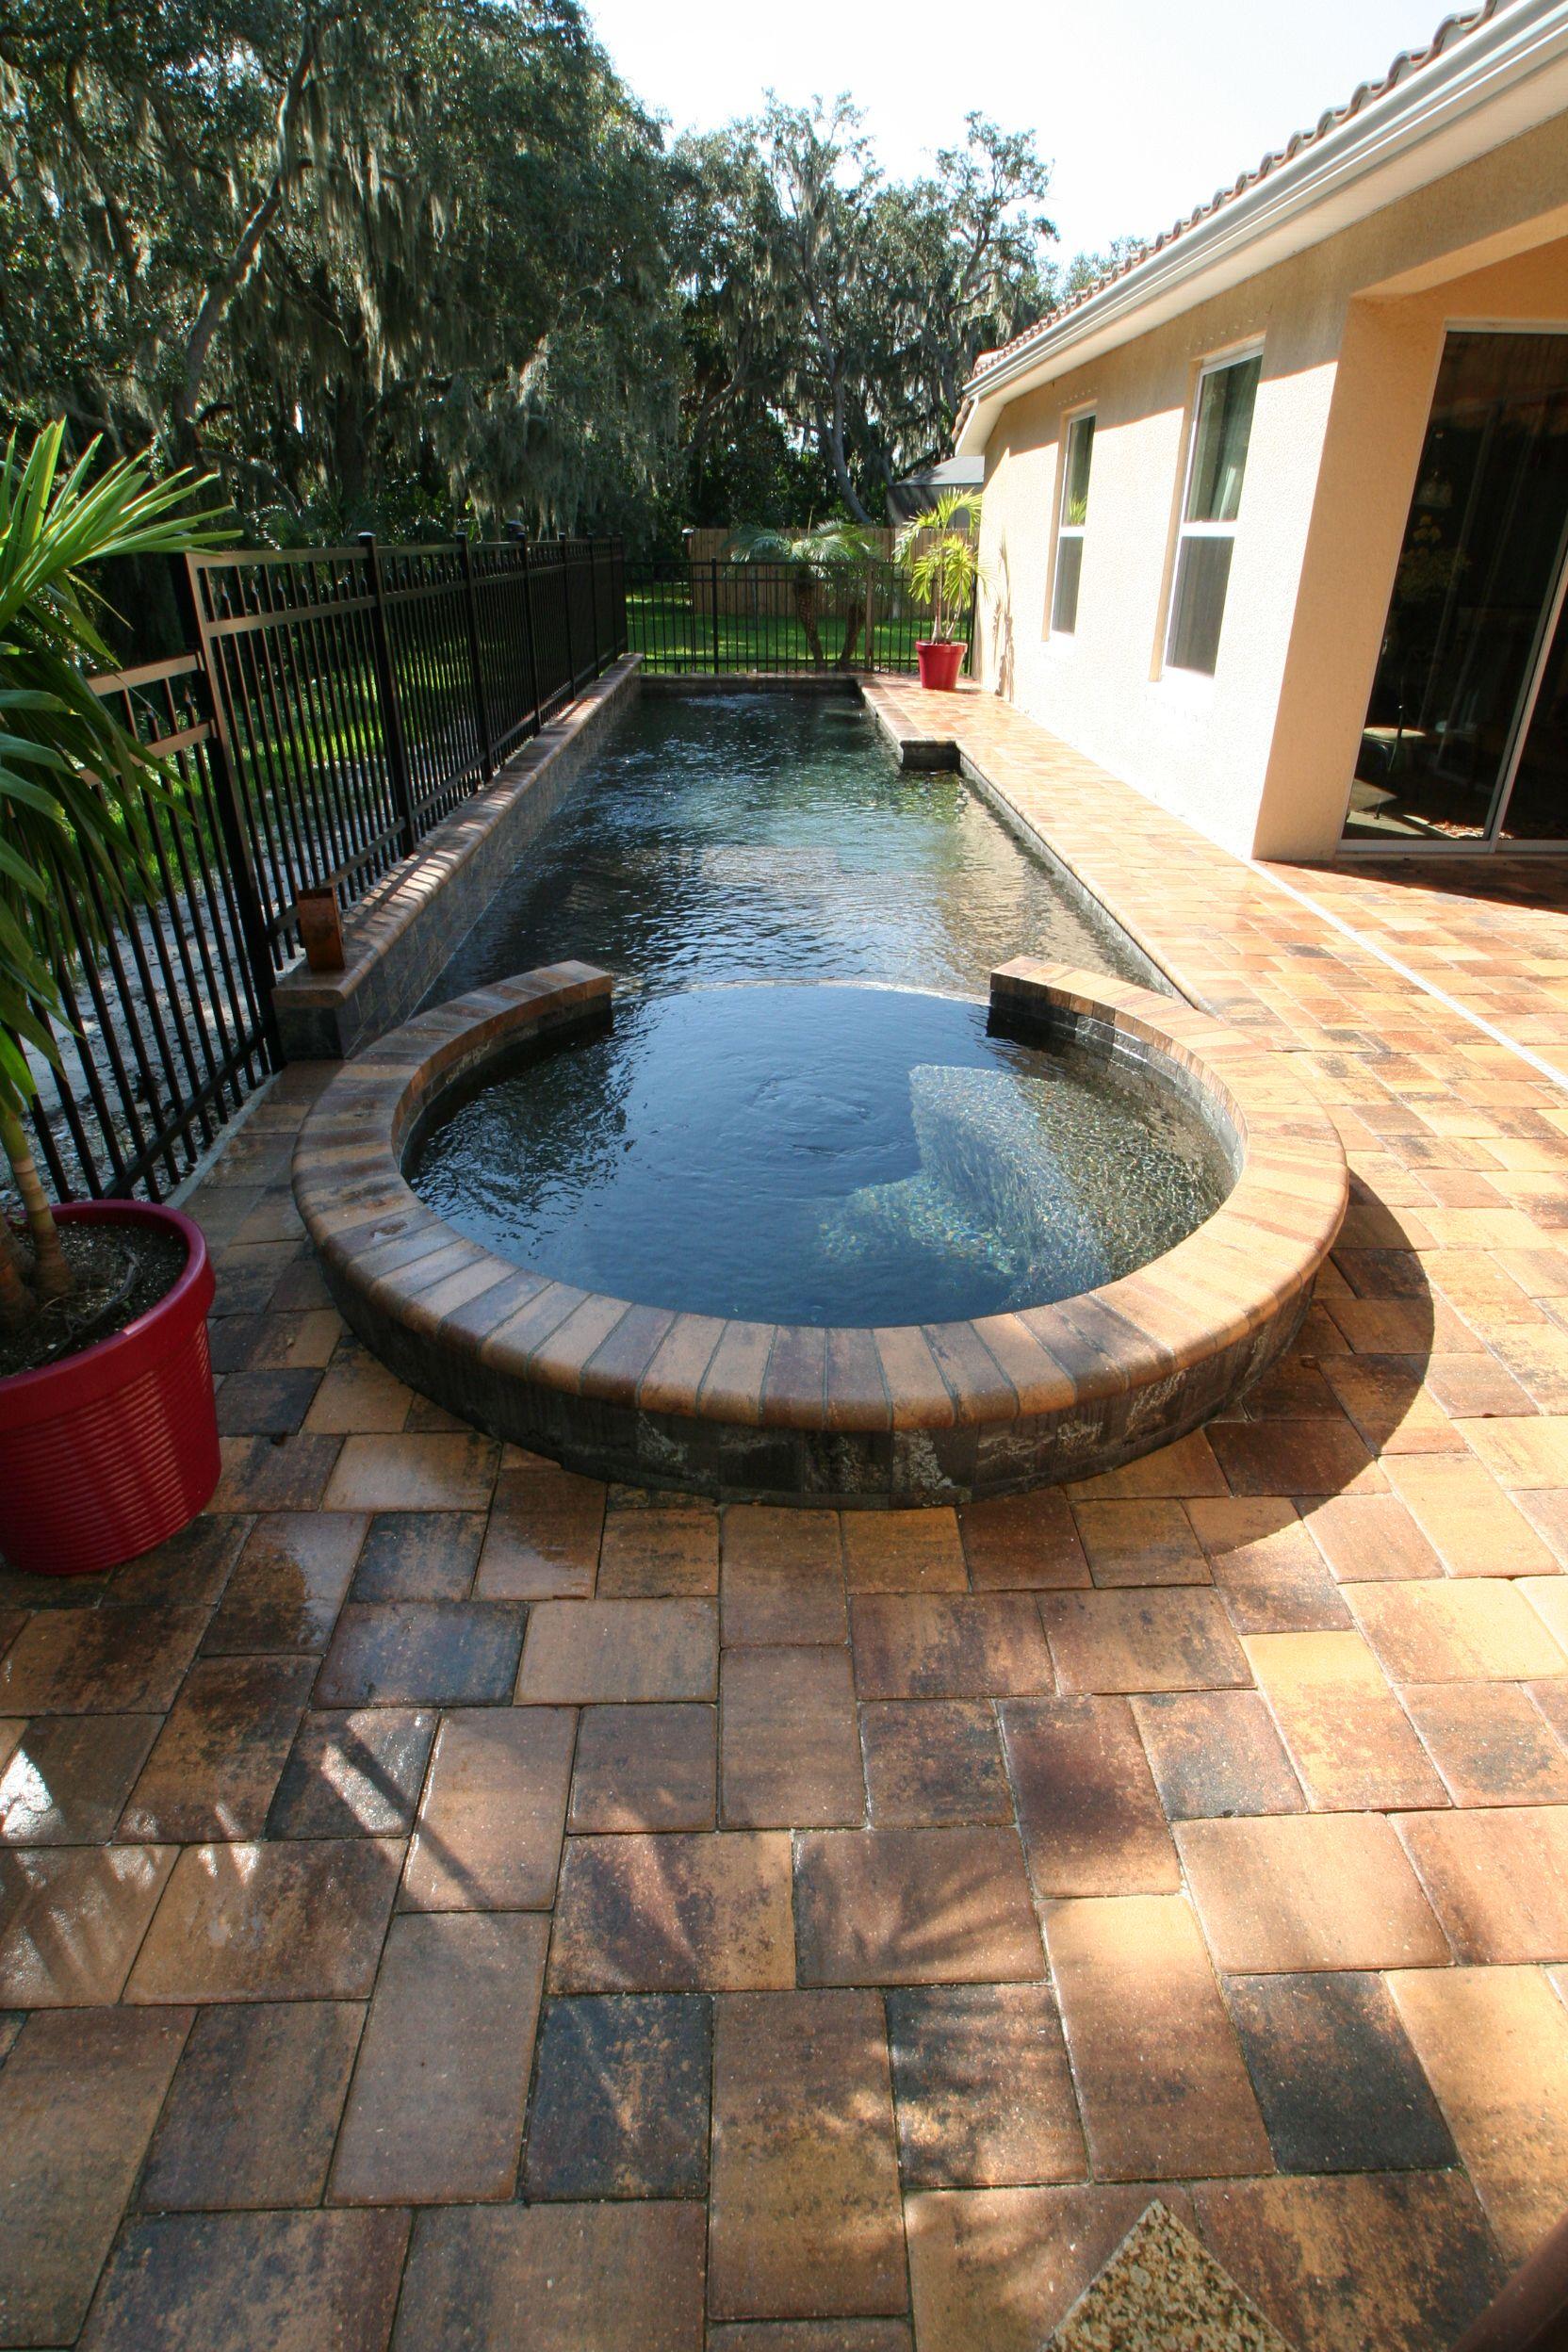 Spa And Lap Pool By Duwet Inc Backyard Pool Swimming Pool Designs Swimming Pools Backyard